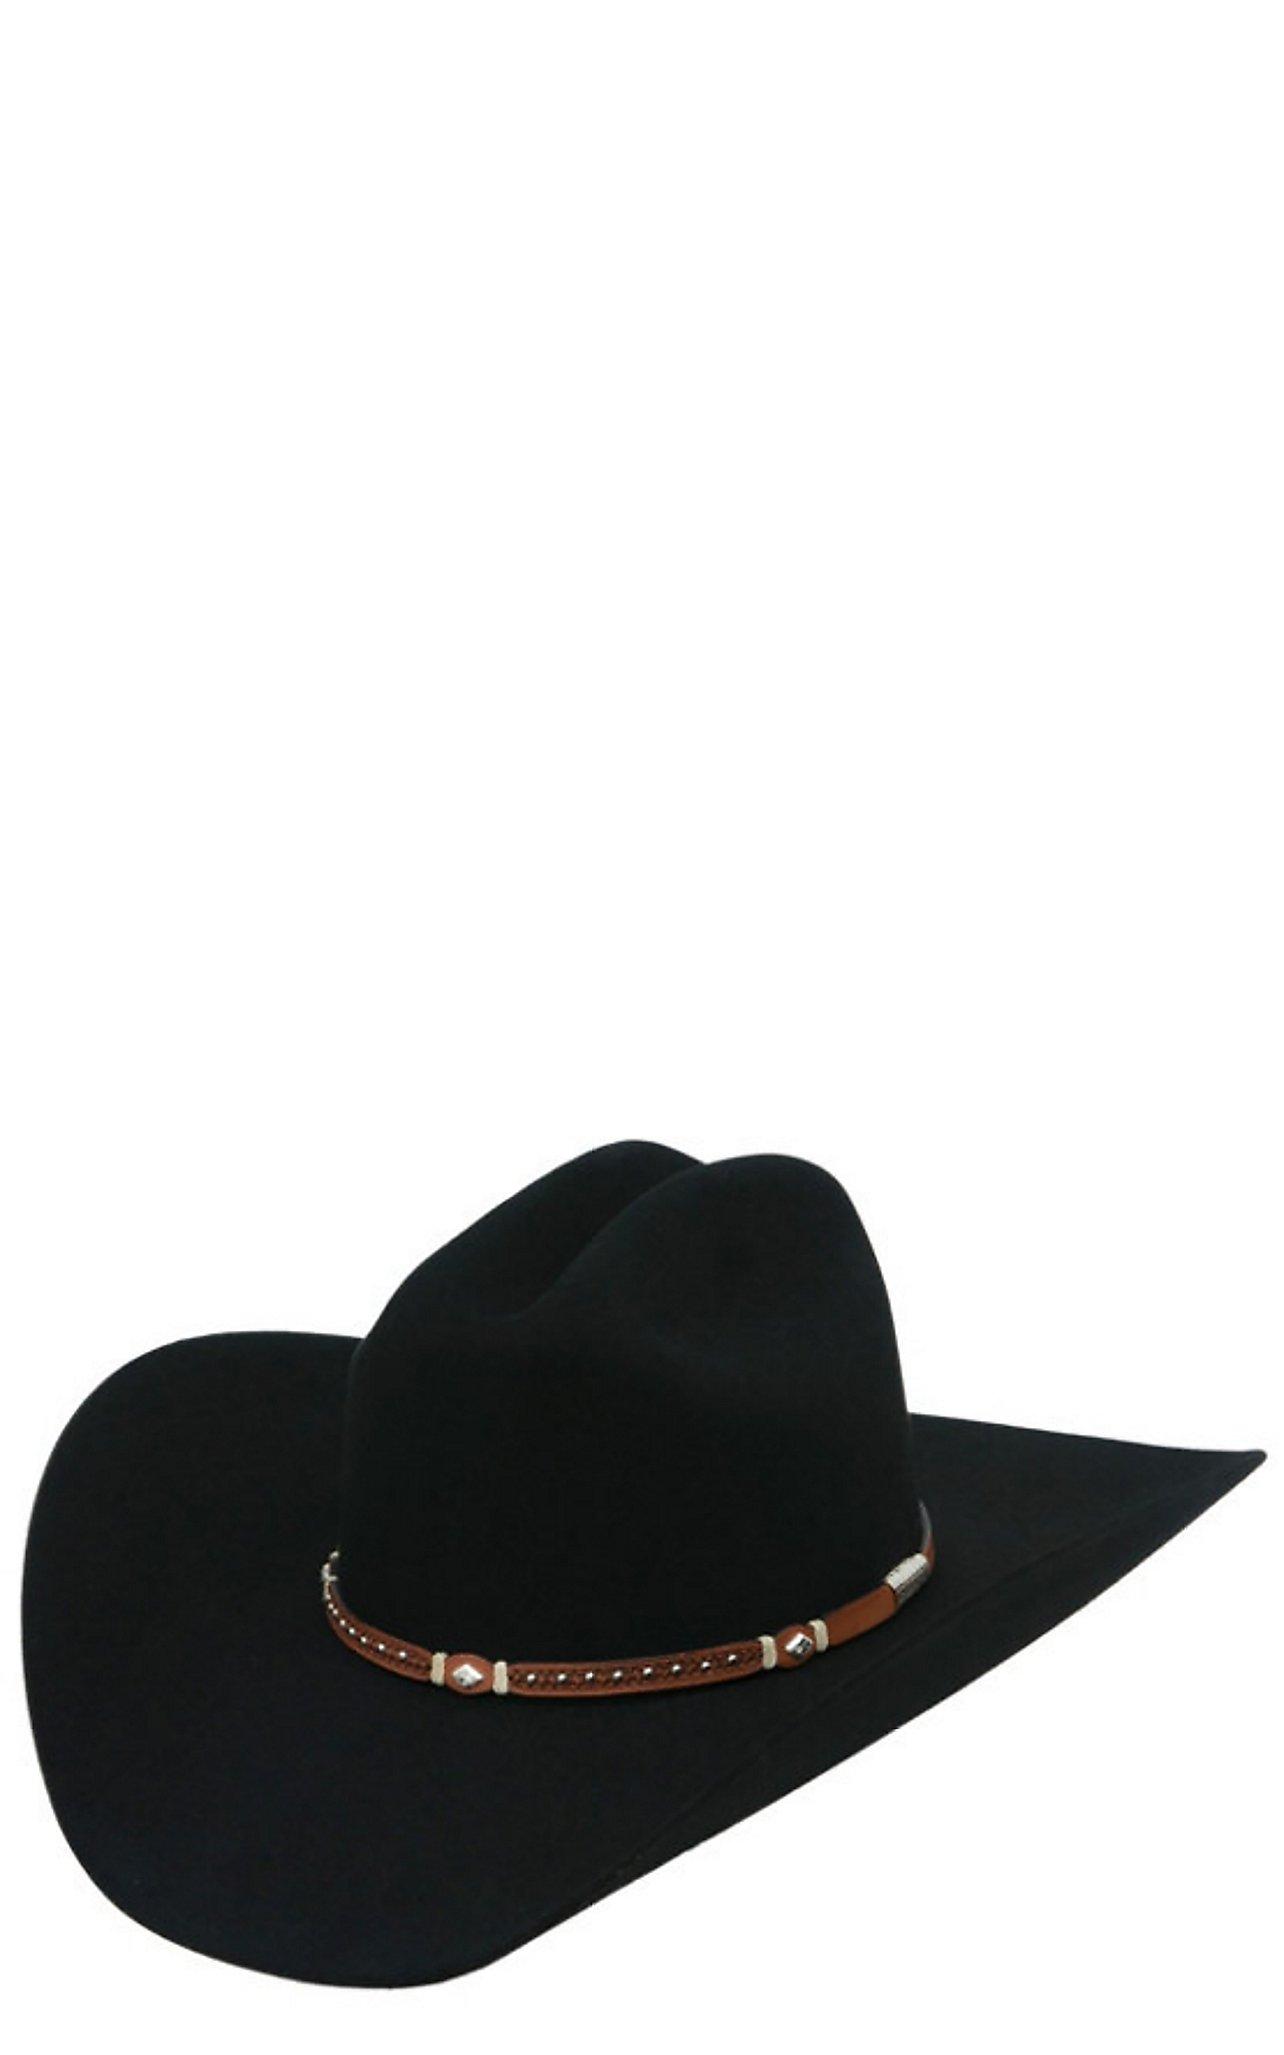 2d0a61ac249 Stetson 6X Monterrey T Black Felt Cowboy Hat